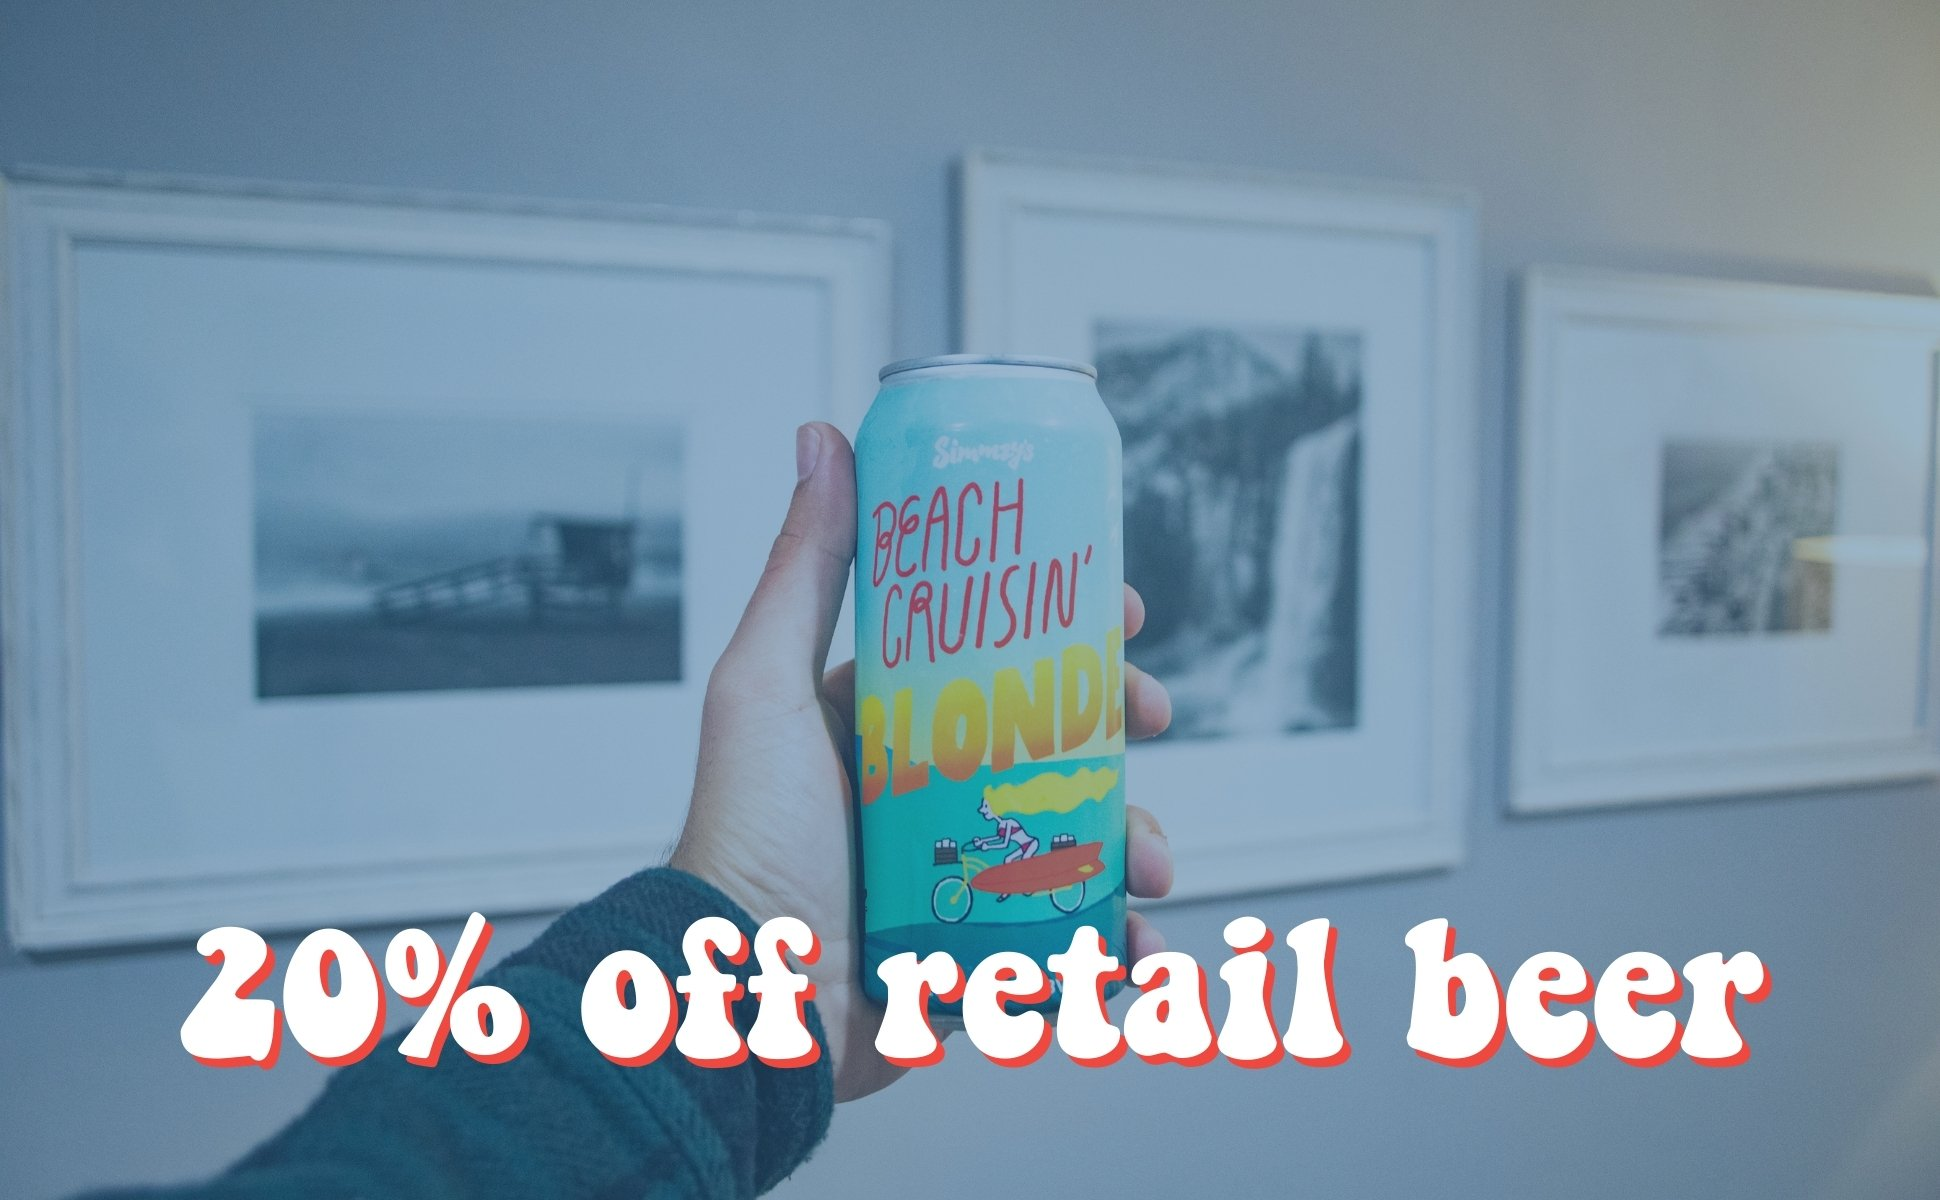 20% off Retail Craft Beer for Simmzy's Beer Club members.